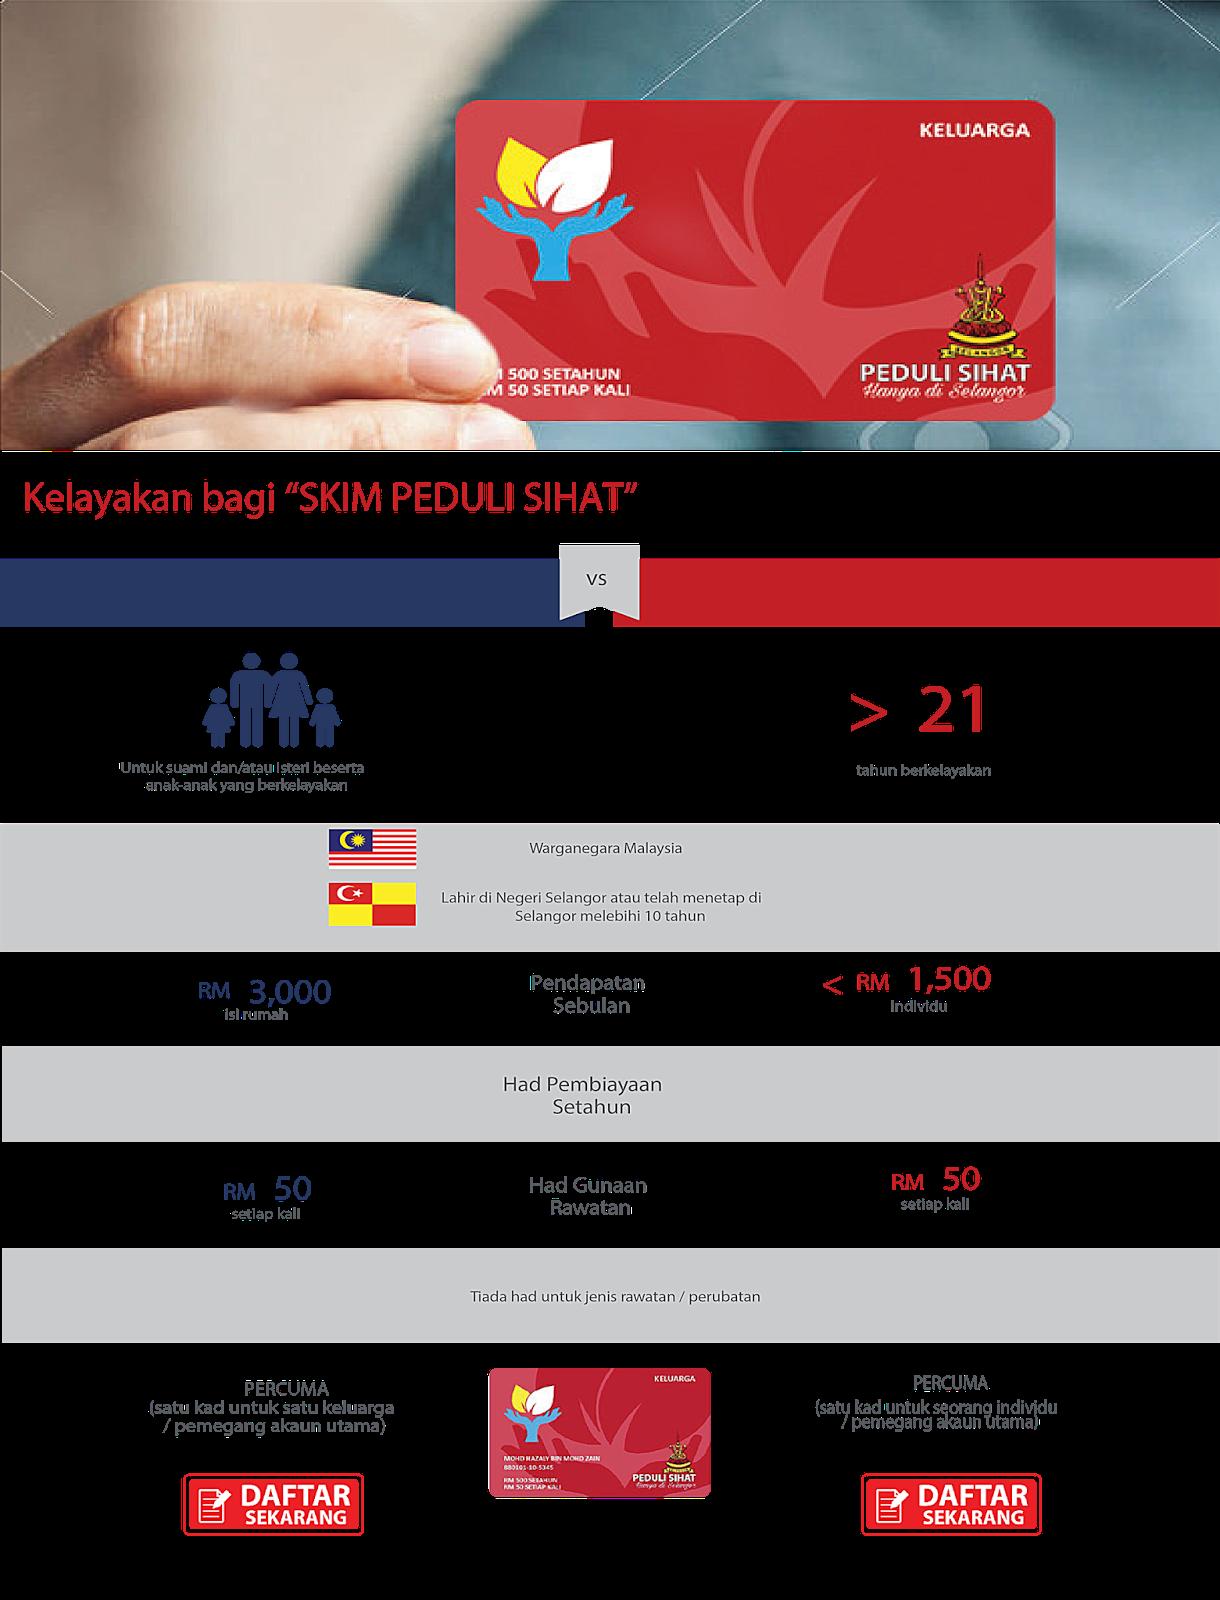 Kad Peduli Sihat Selangor Untuk Keluarga Dan Individu With Images Selangor Social Media Dan